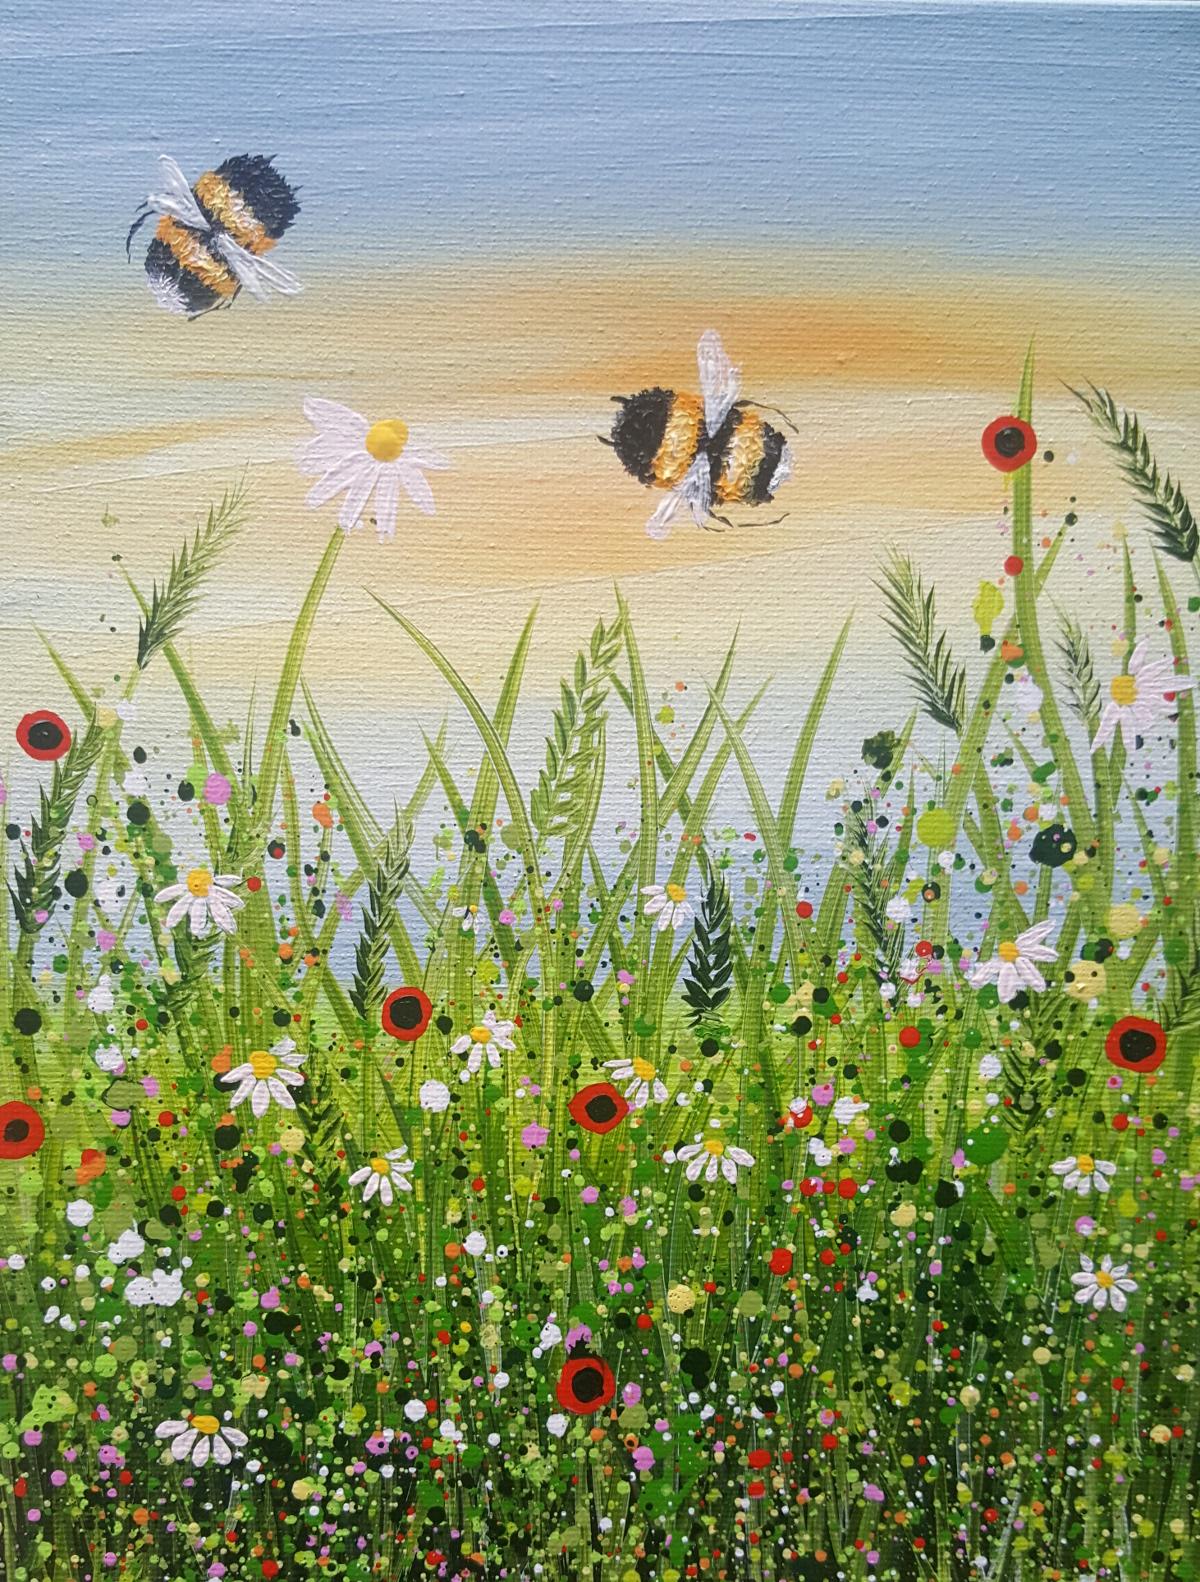 Bee utiful Meadows #2